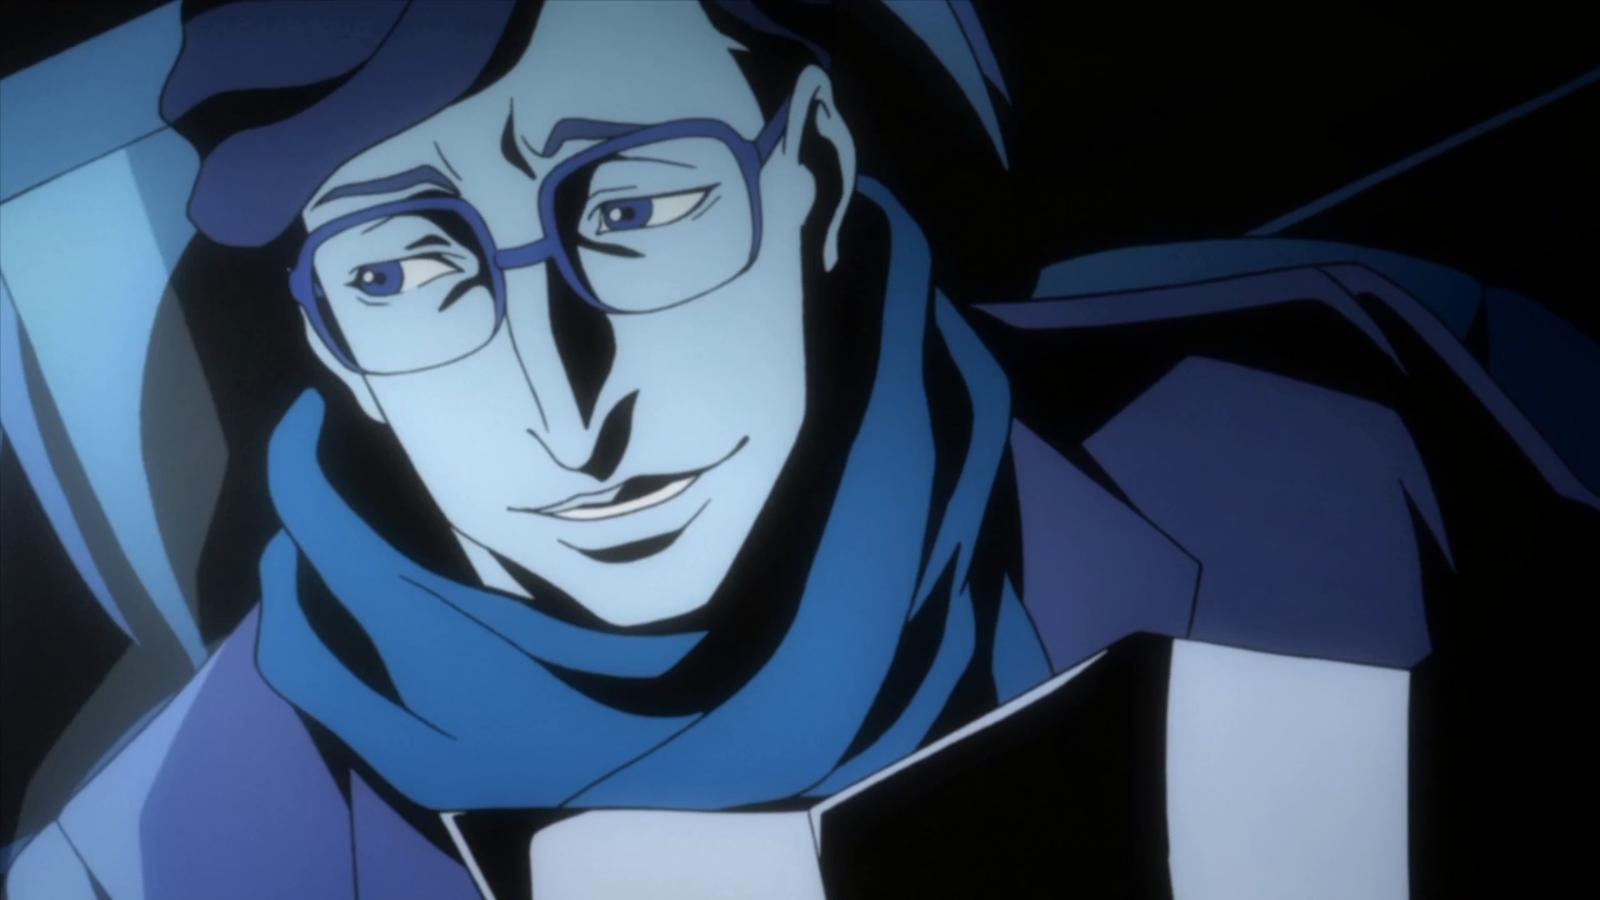 David (Anime Series)